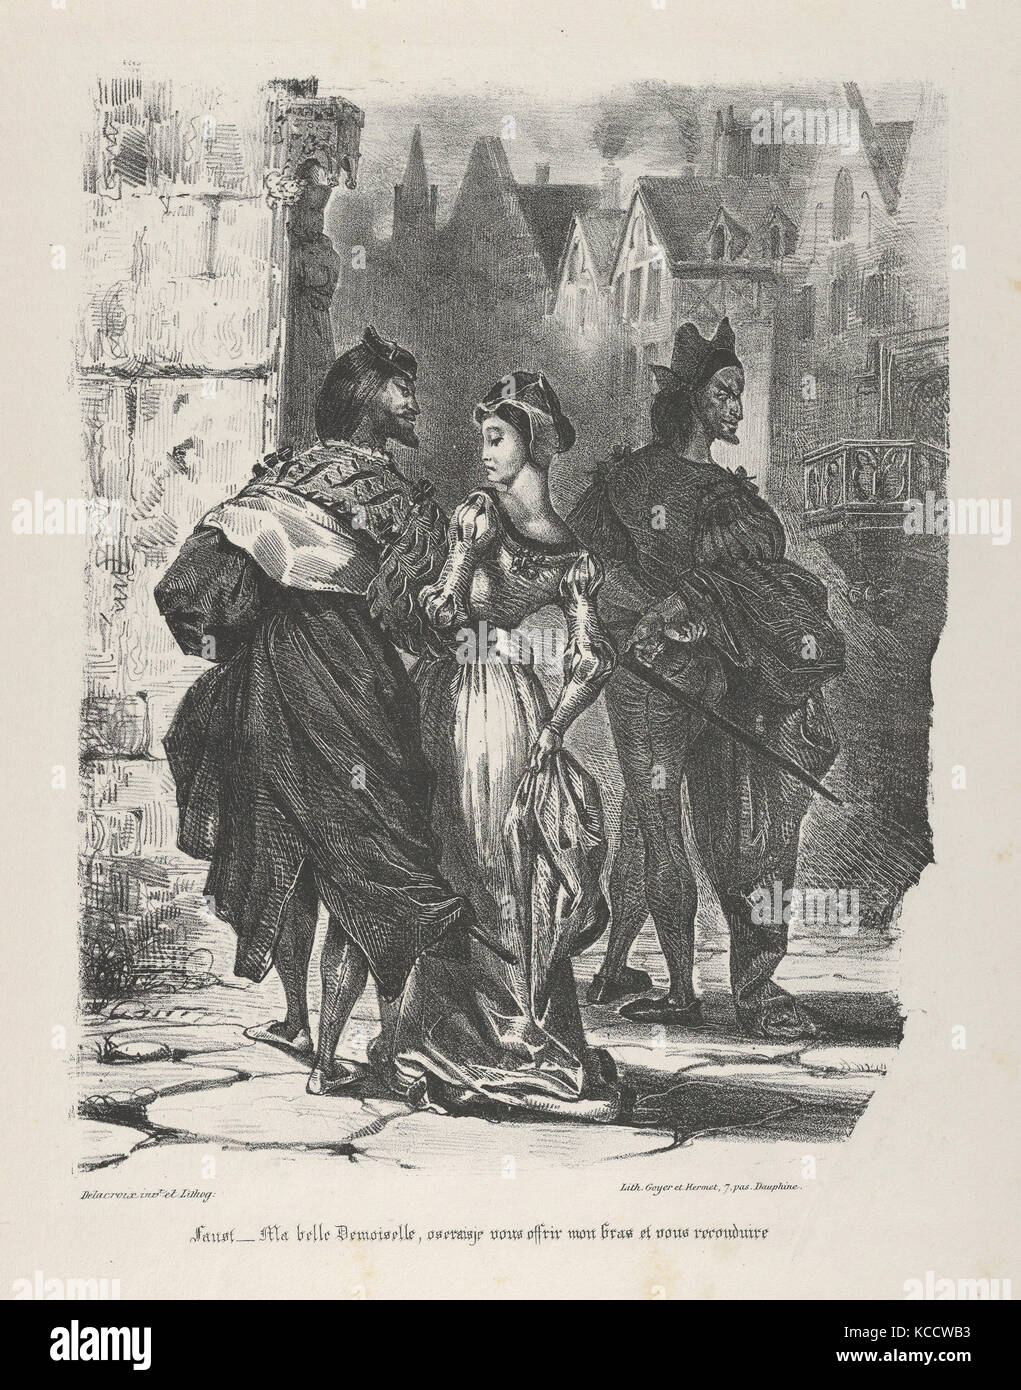 Faust Trying to Seduce Marguerite (Goethe, Faust), Eugène Delacroix, 1825–27 - Stock Image